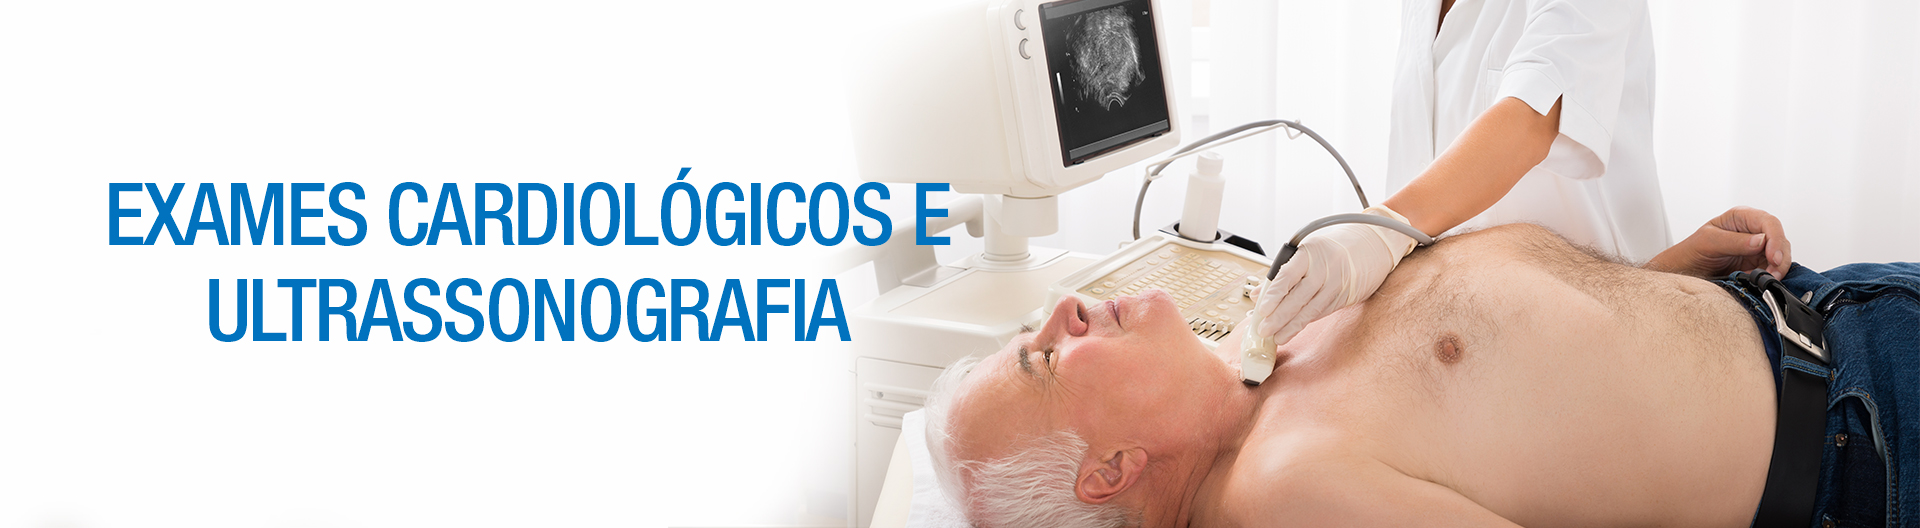 Cardiologia em Taubaté | Endocard - Medicina Diagnóstica